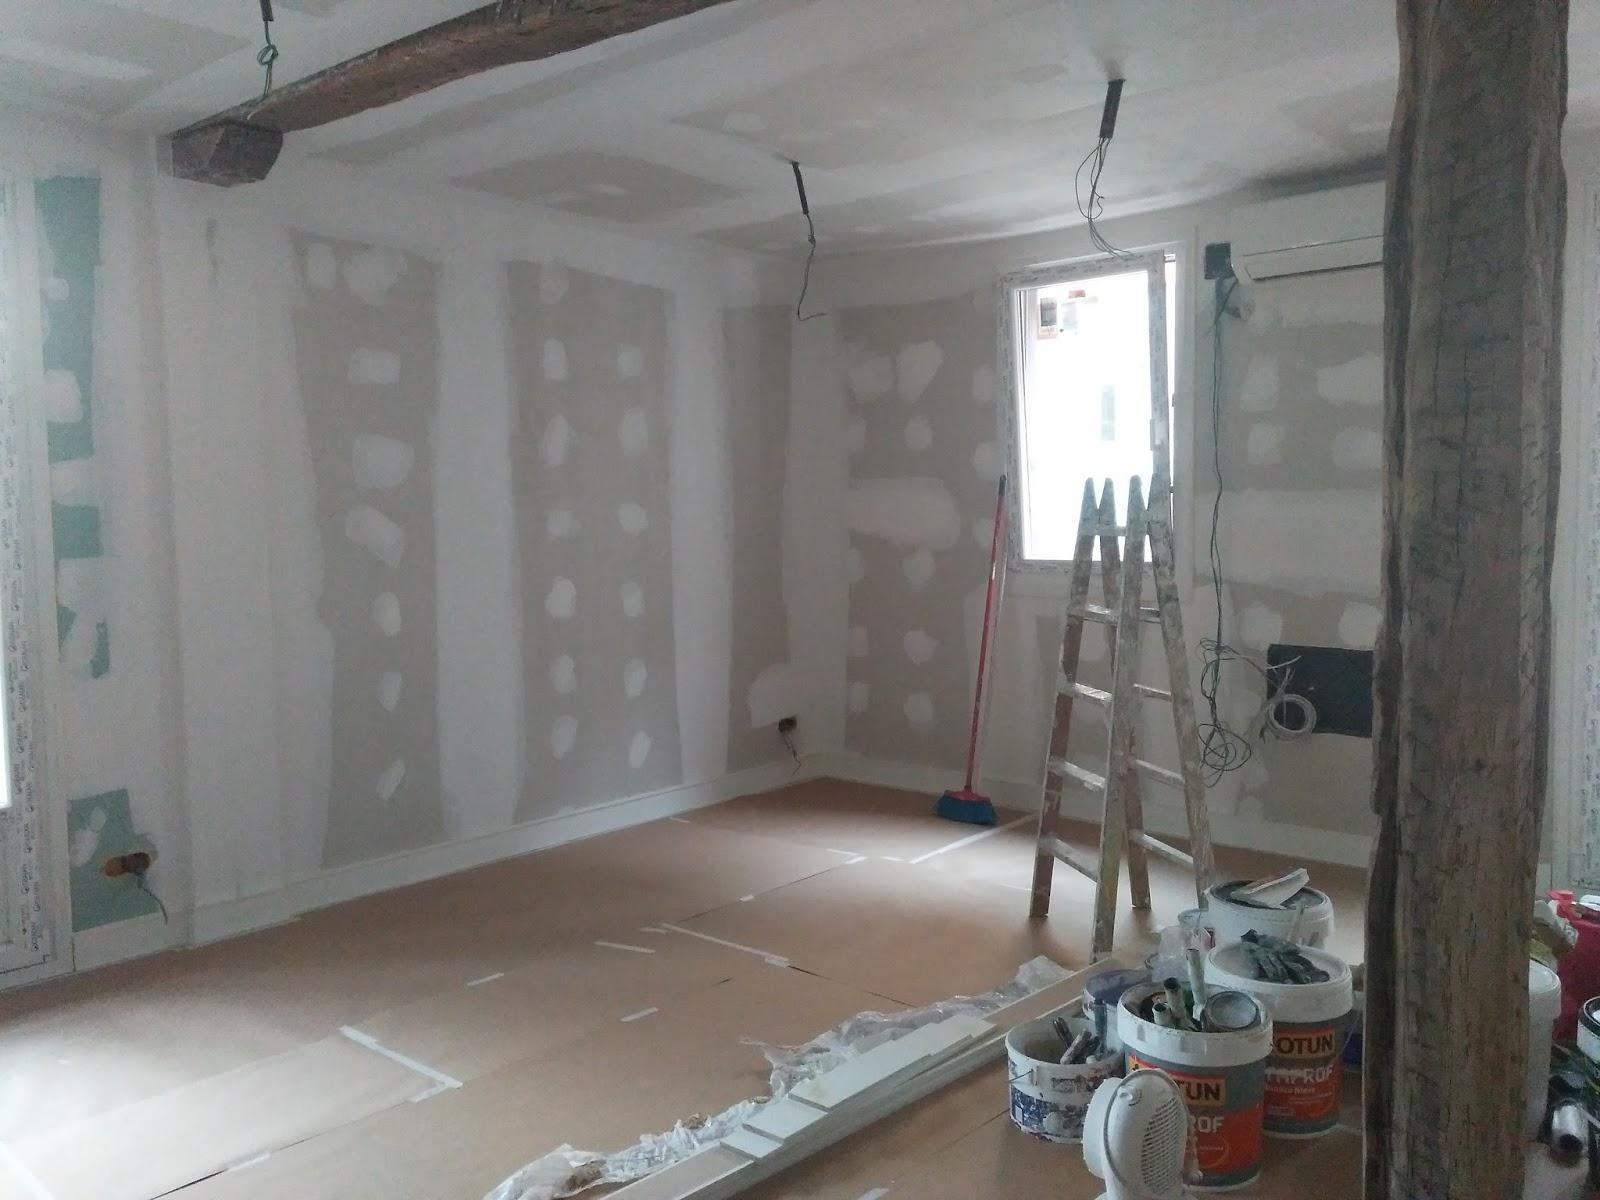 Recikla arte como preparar unas paredes de pladur antes - Pladur para paredes ...